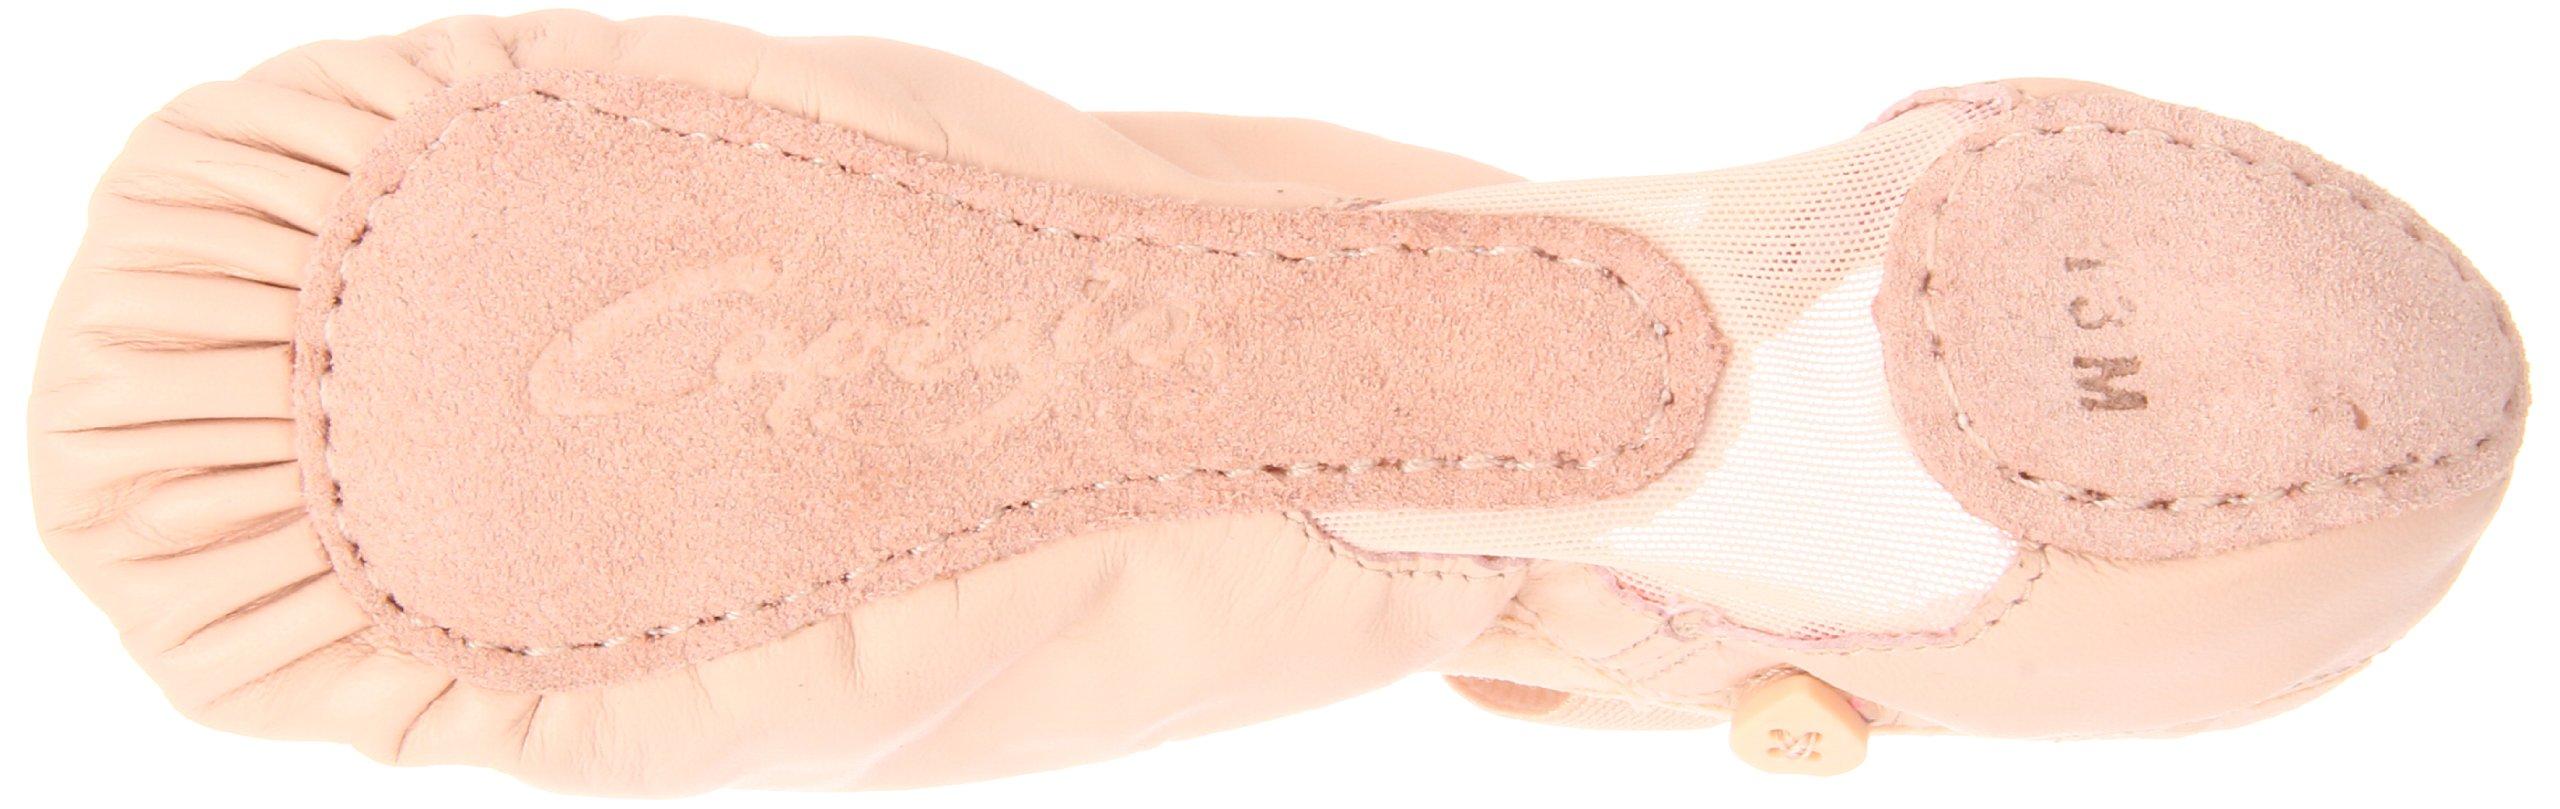 Capezio Love Ballet Flat (Toddler/Little Kid),Pink,11 M US Little Kid by Capezio (Image #3)